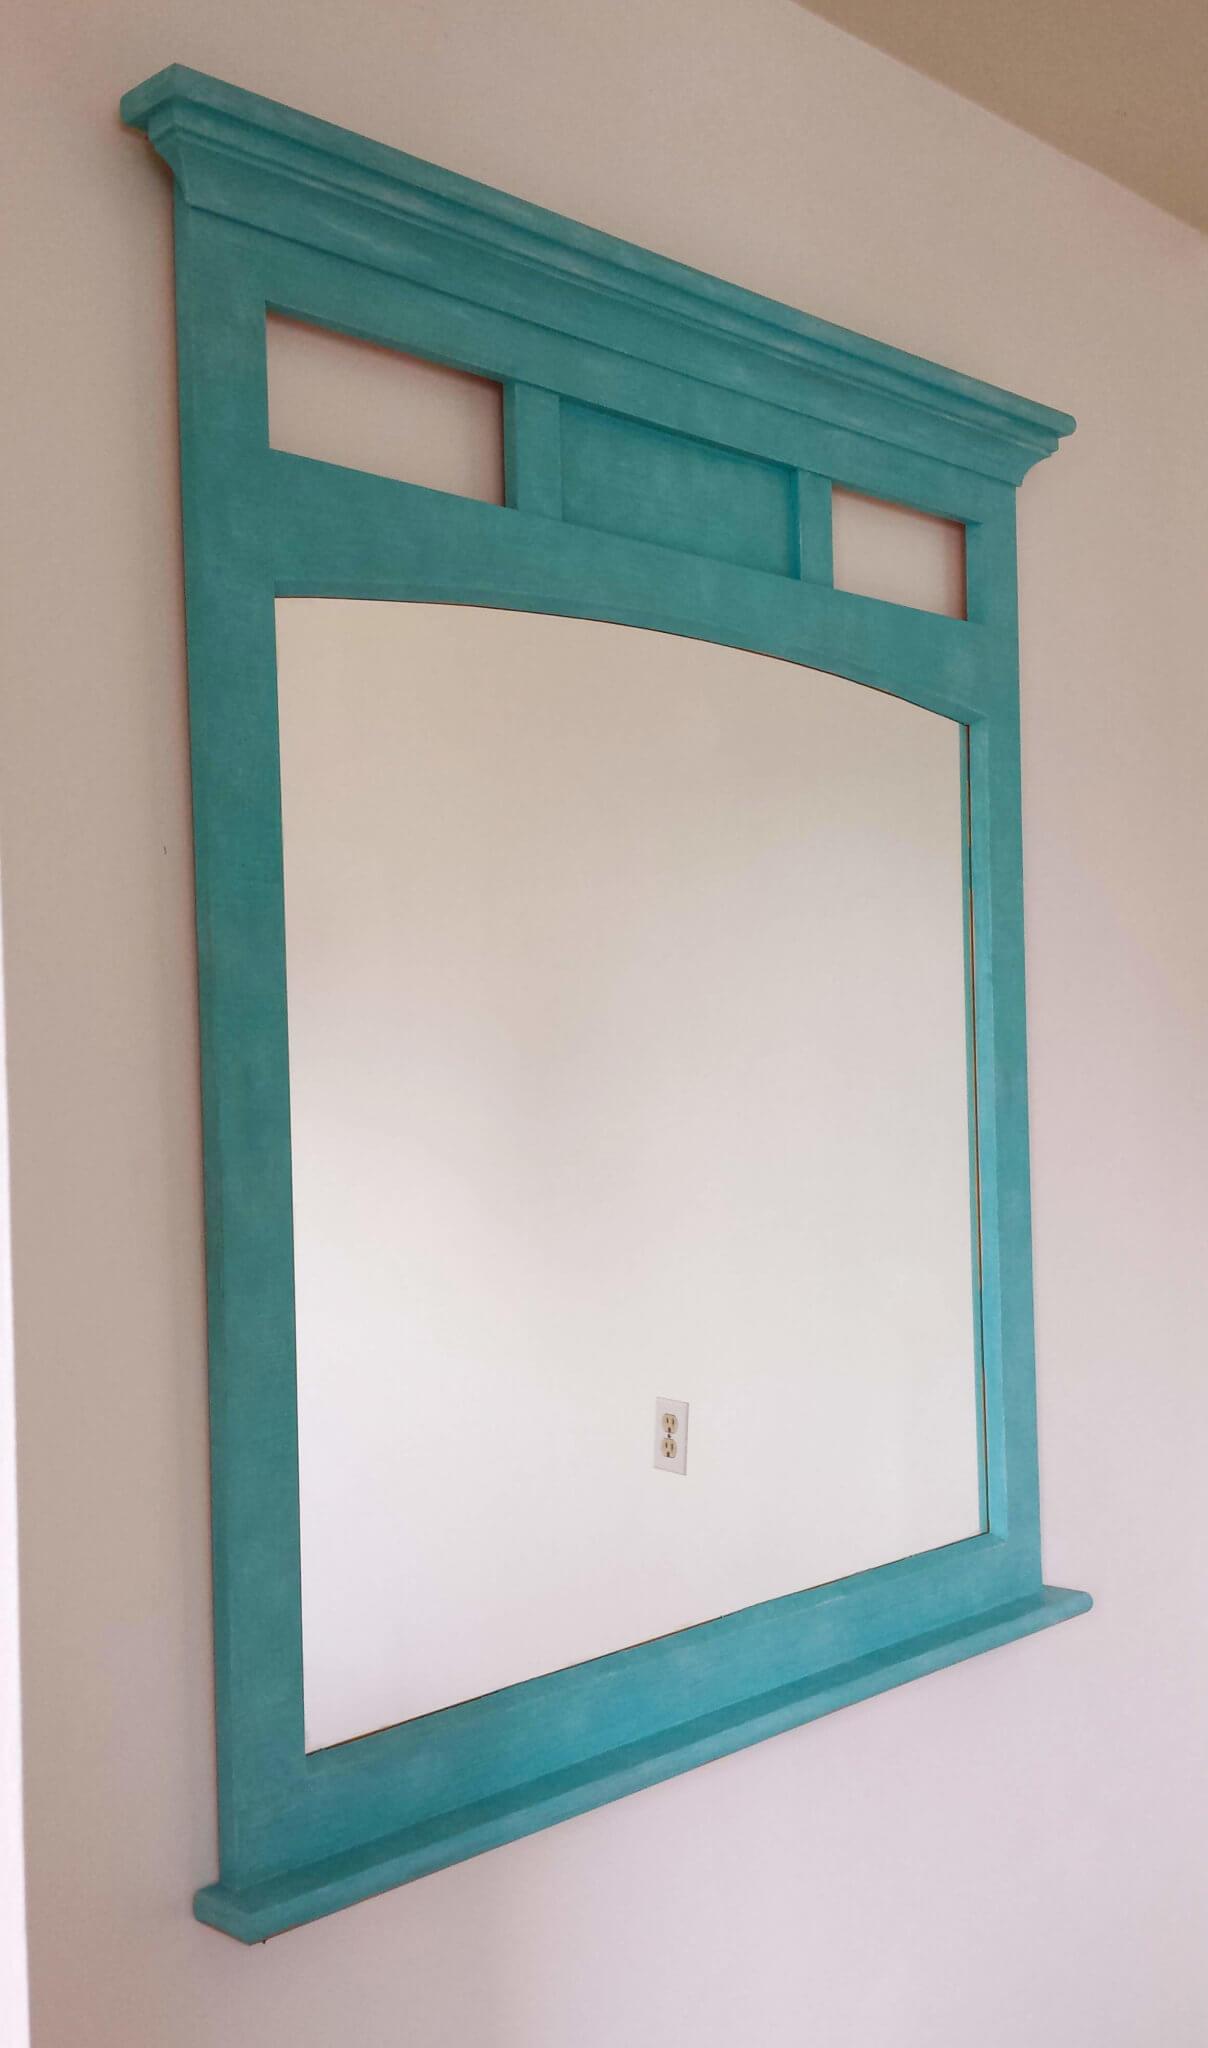 The Turquoise Mirror Diy